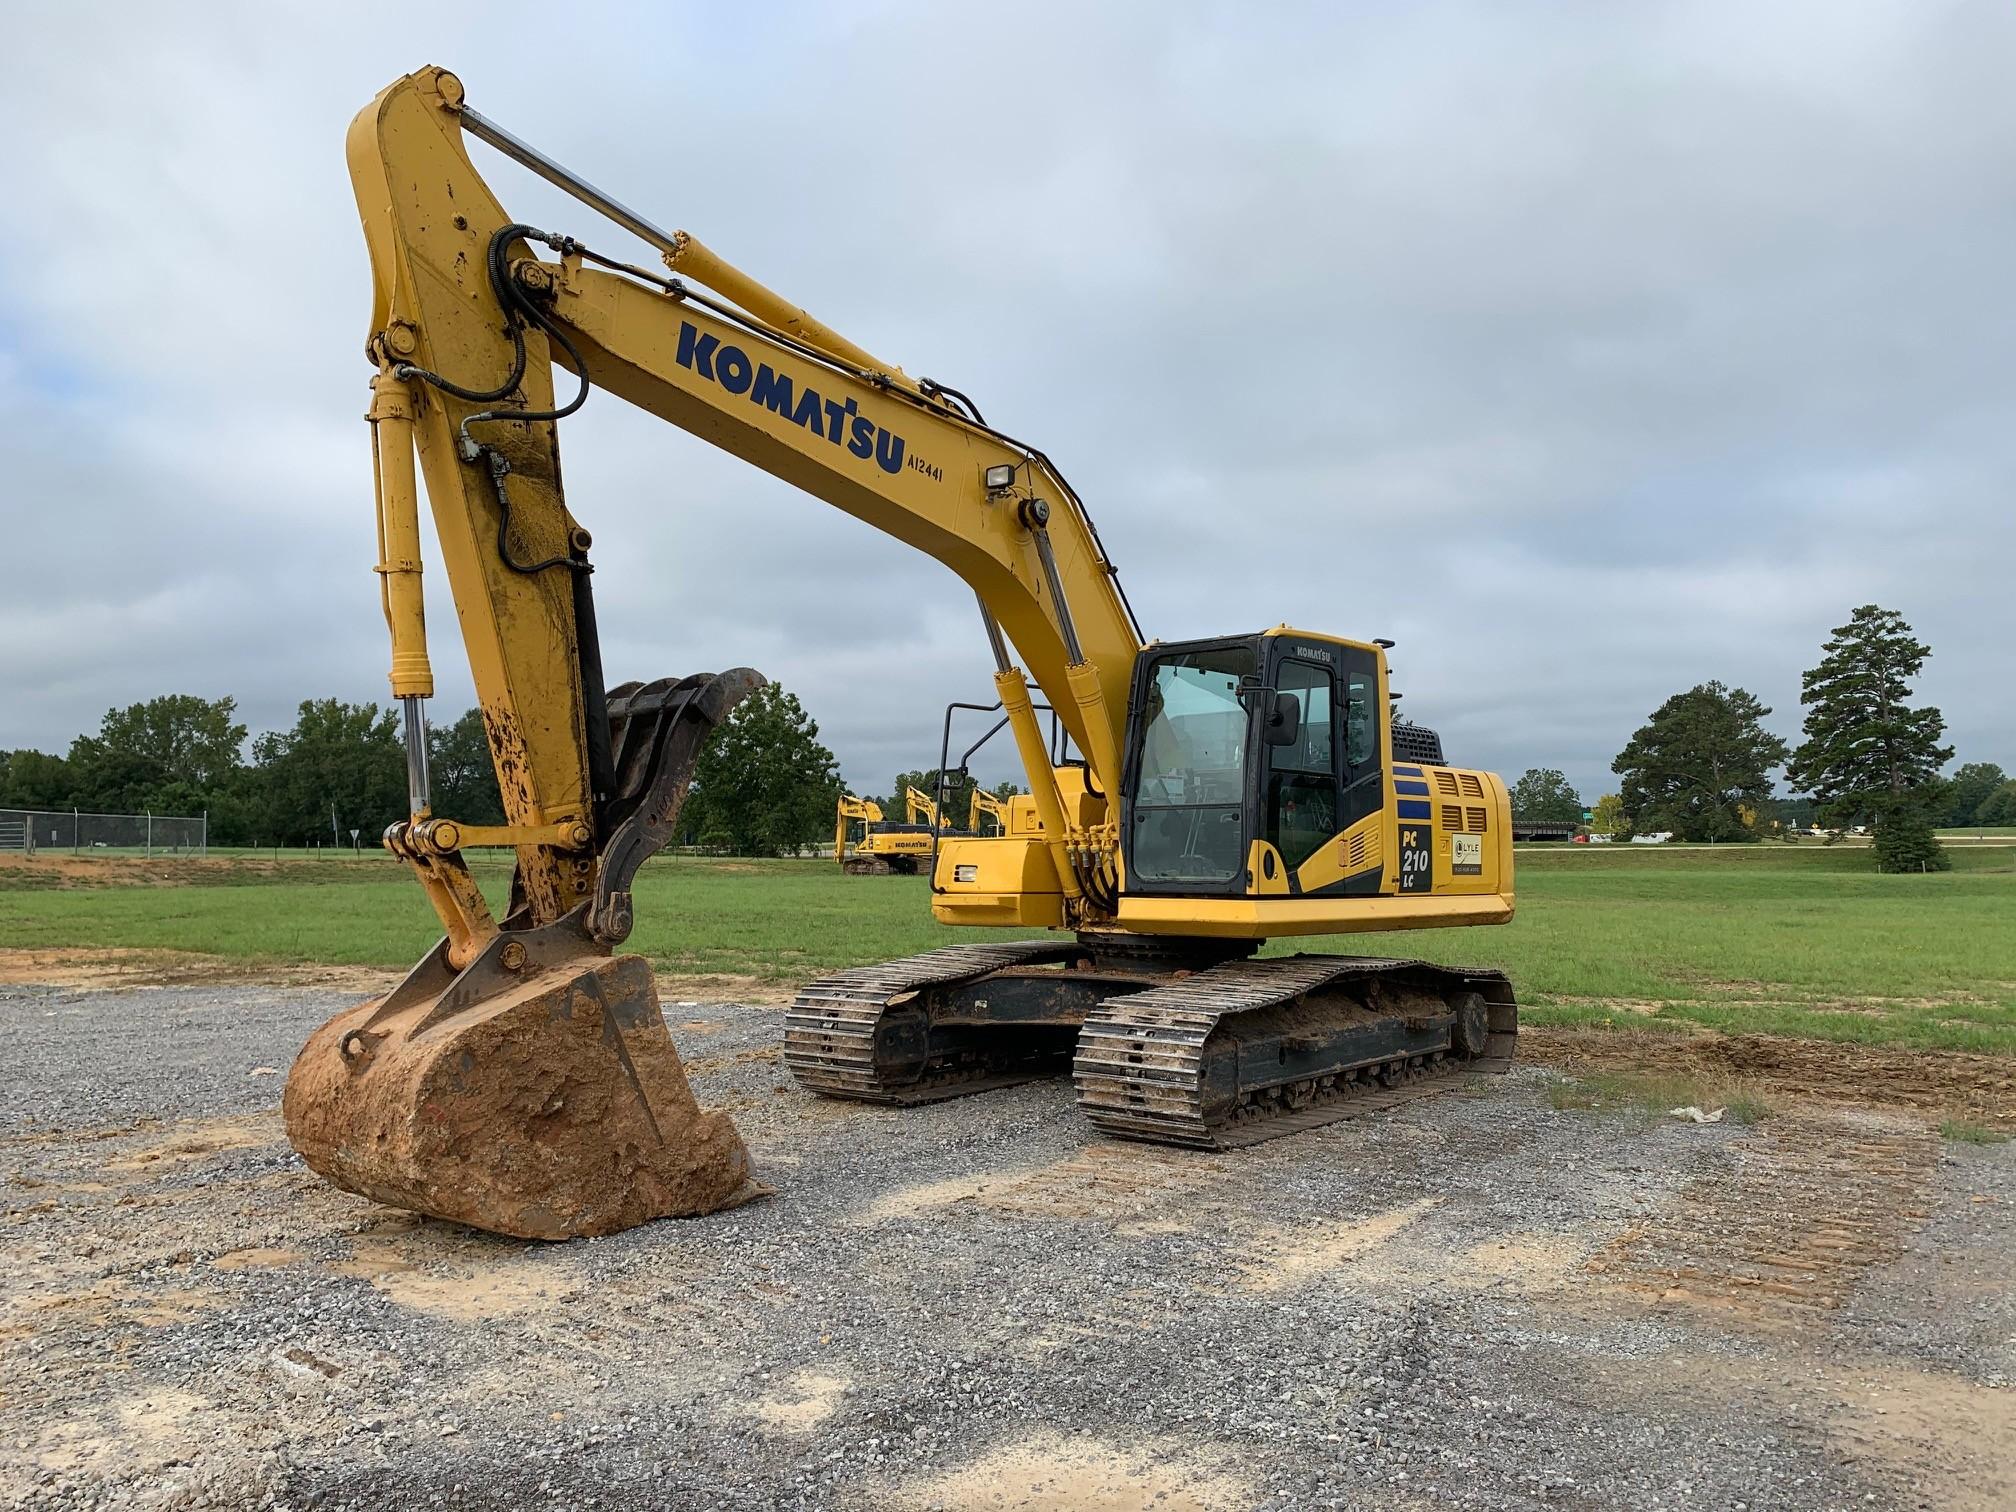 Used, 2018, Komatsu, PC210LC-11, Excavators